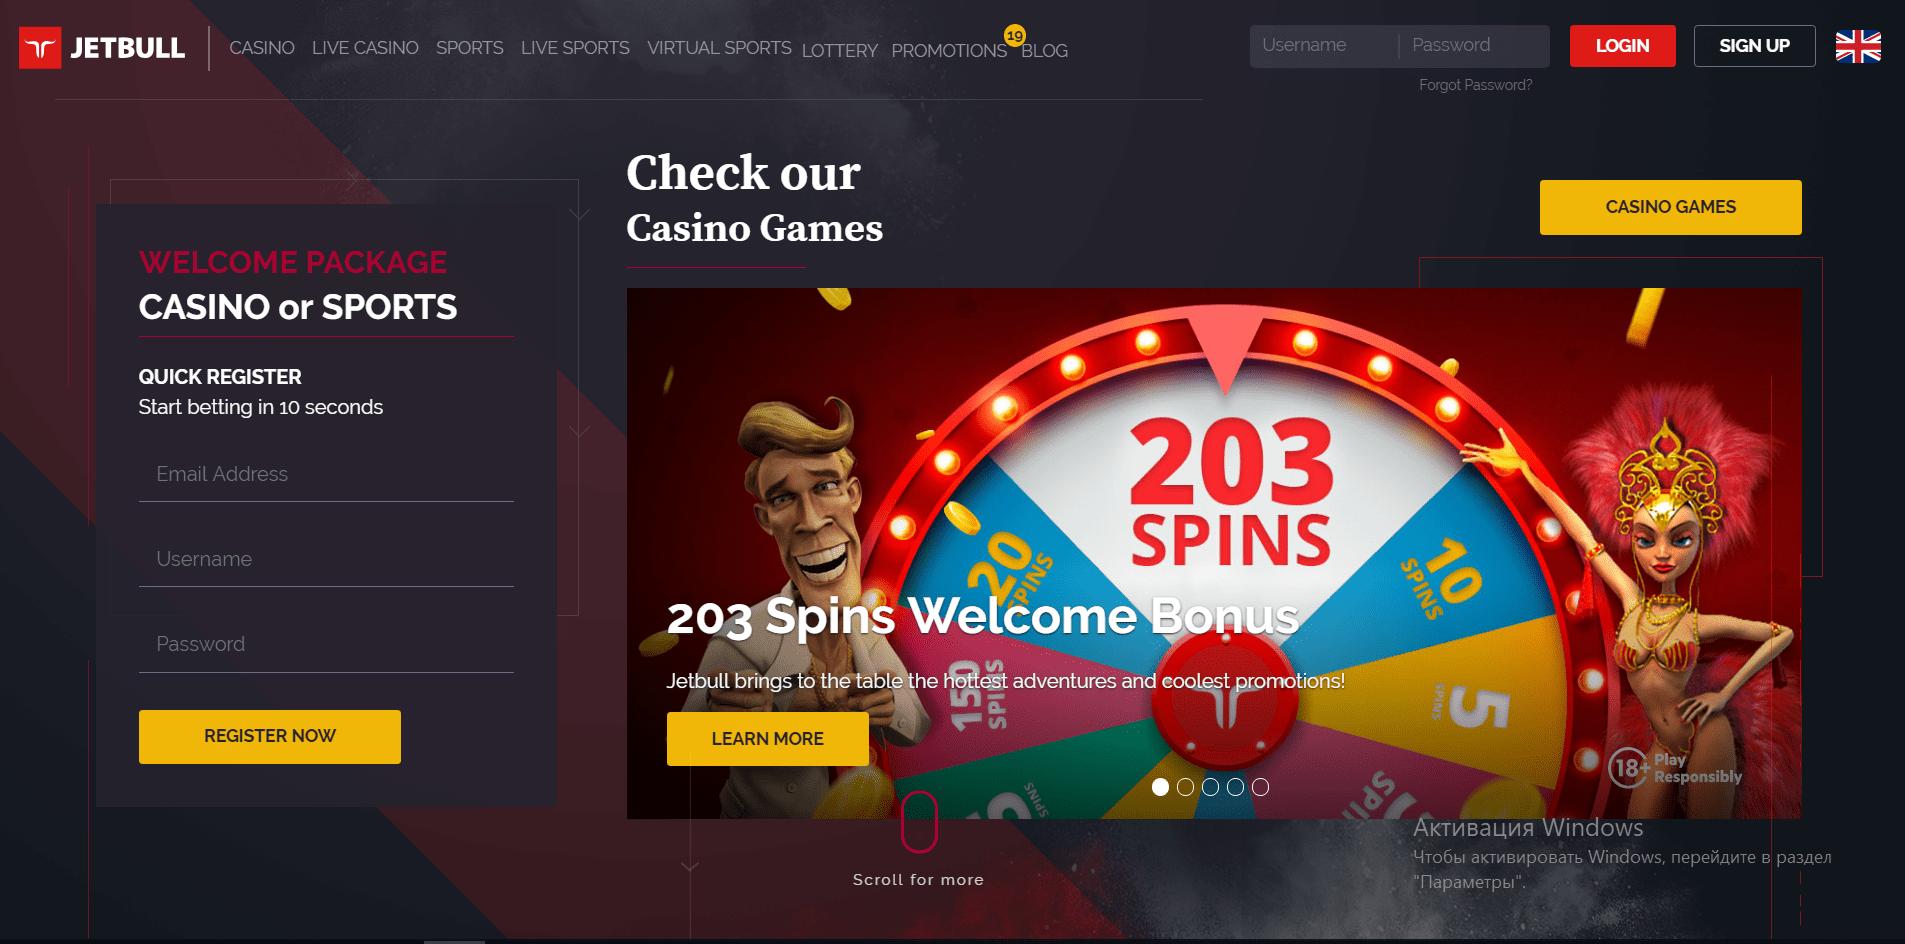 Jetbull casino review 150 casino taxation